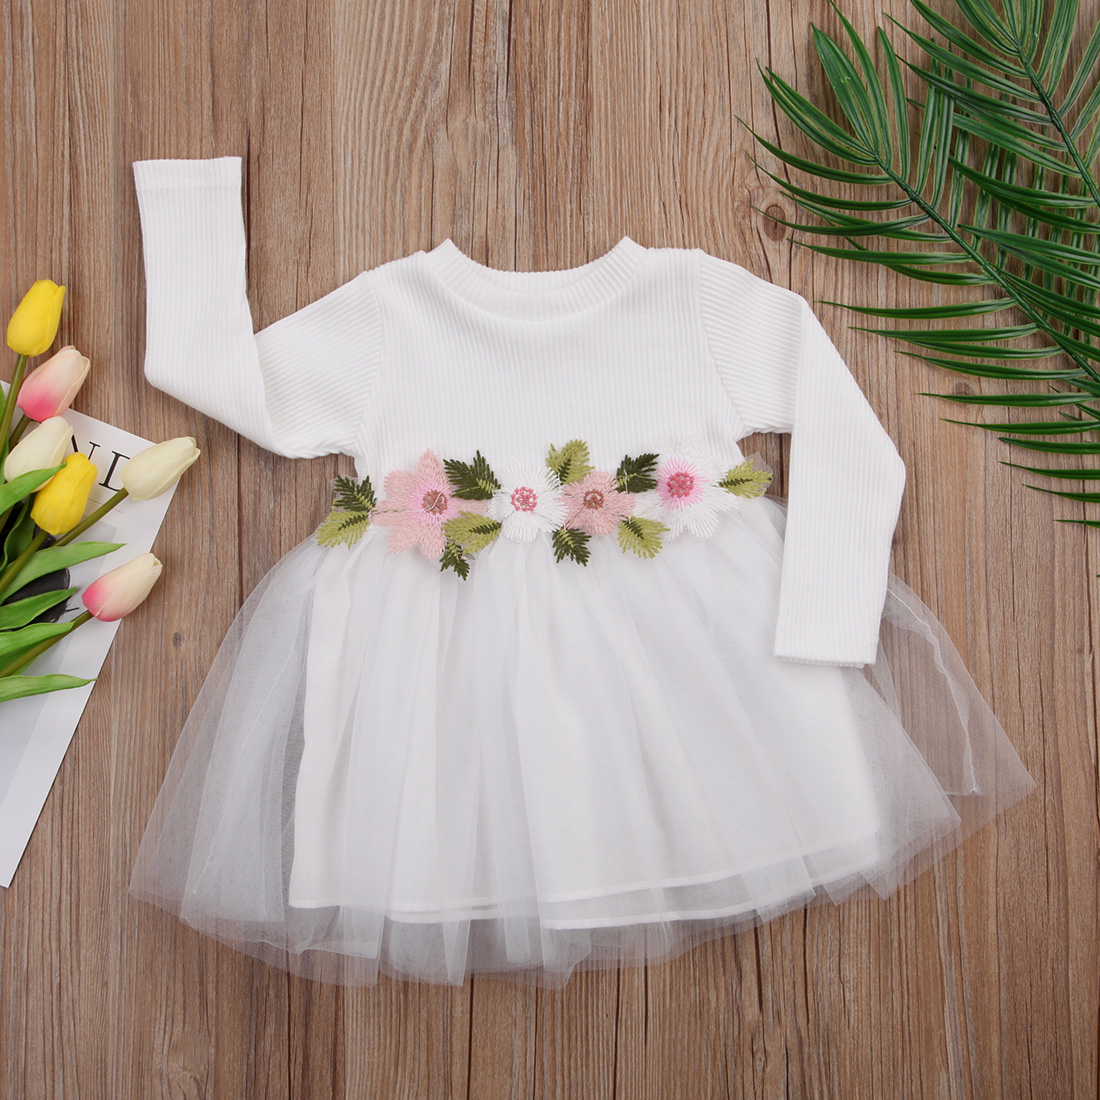 1pc Flower Girls Autumn Winter Knitted Dresses Cute Infant Baby Girl